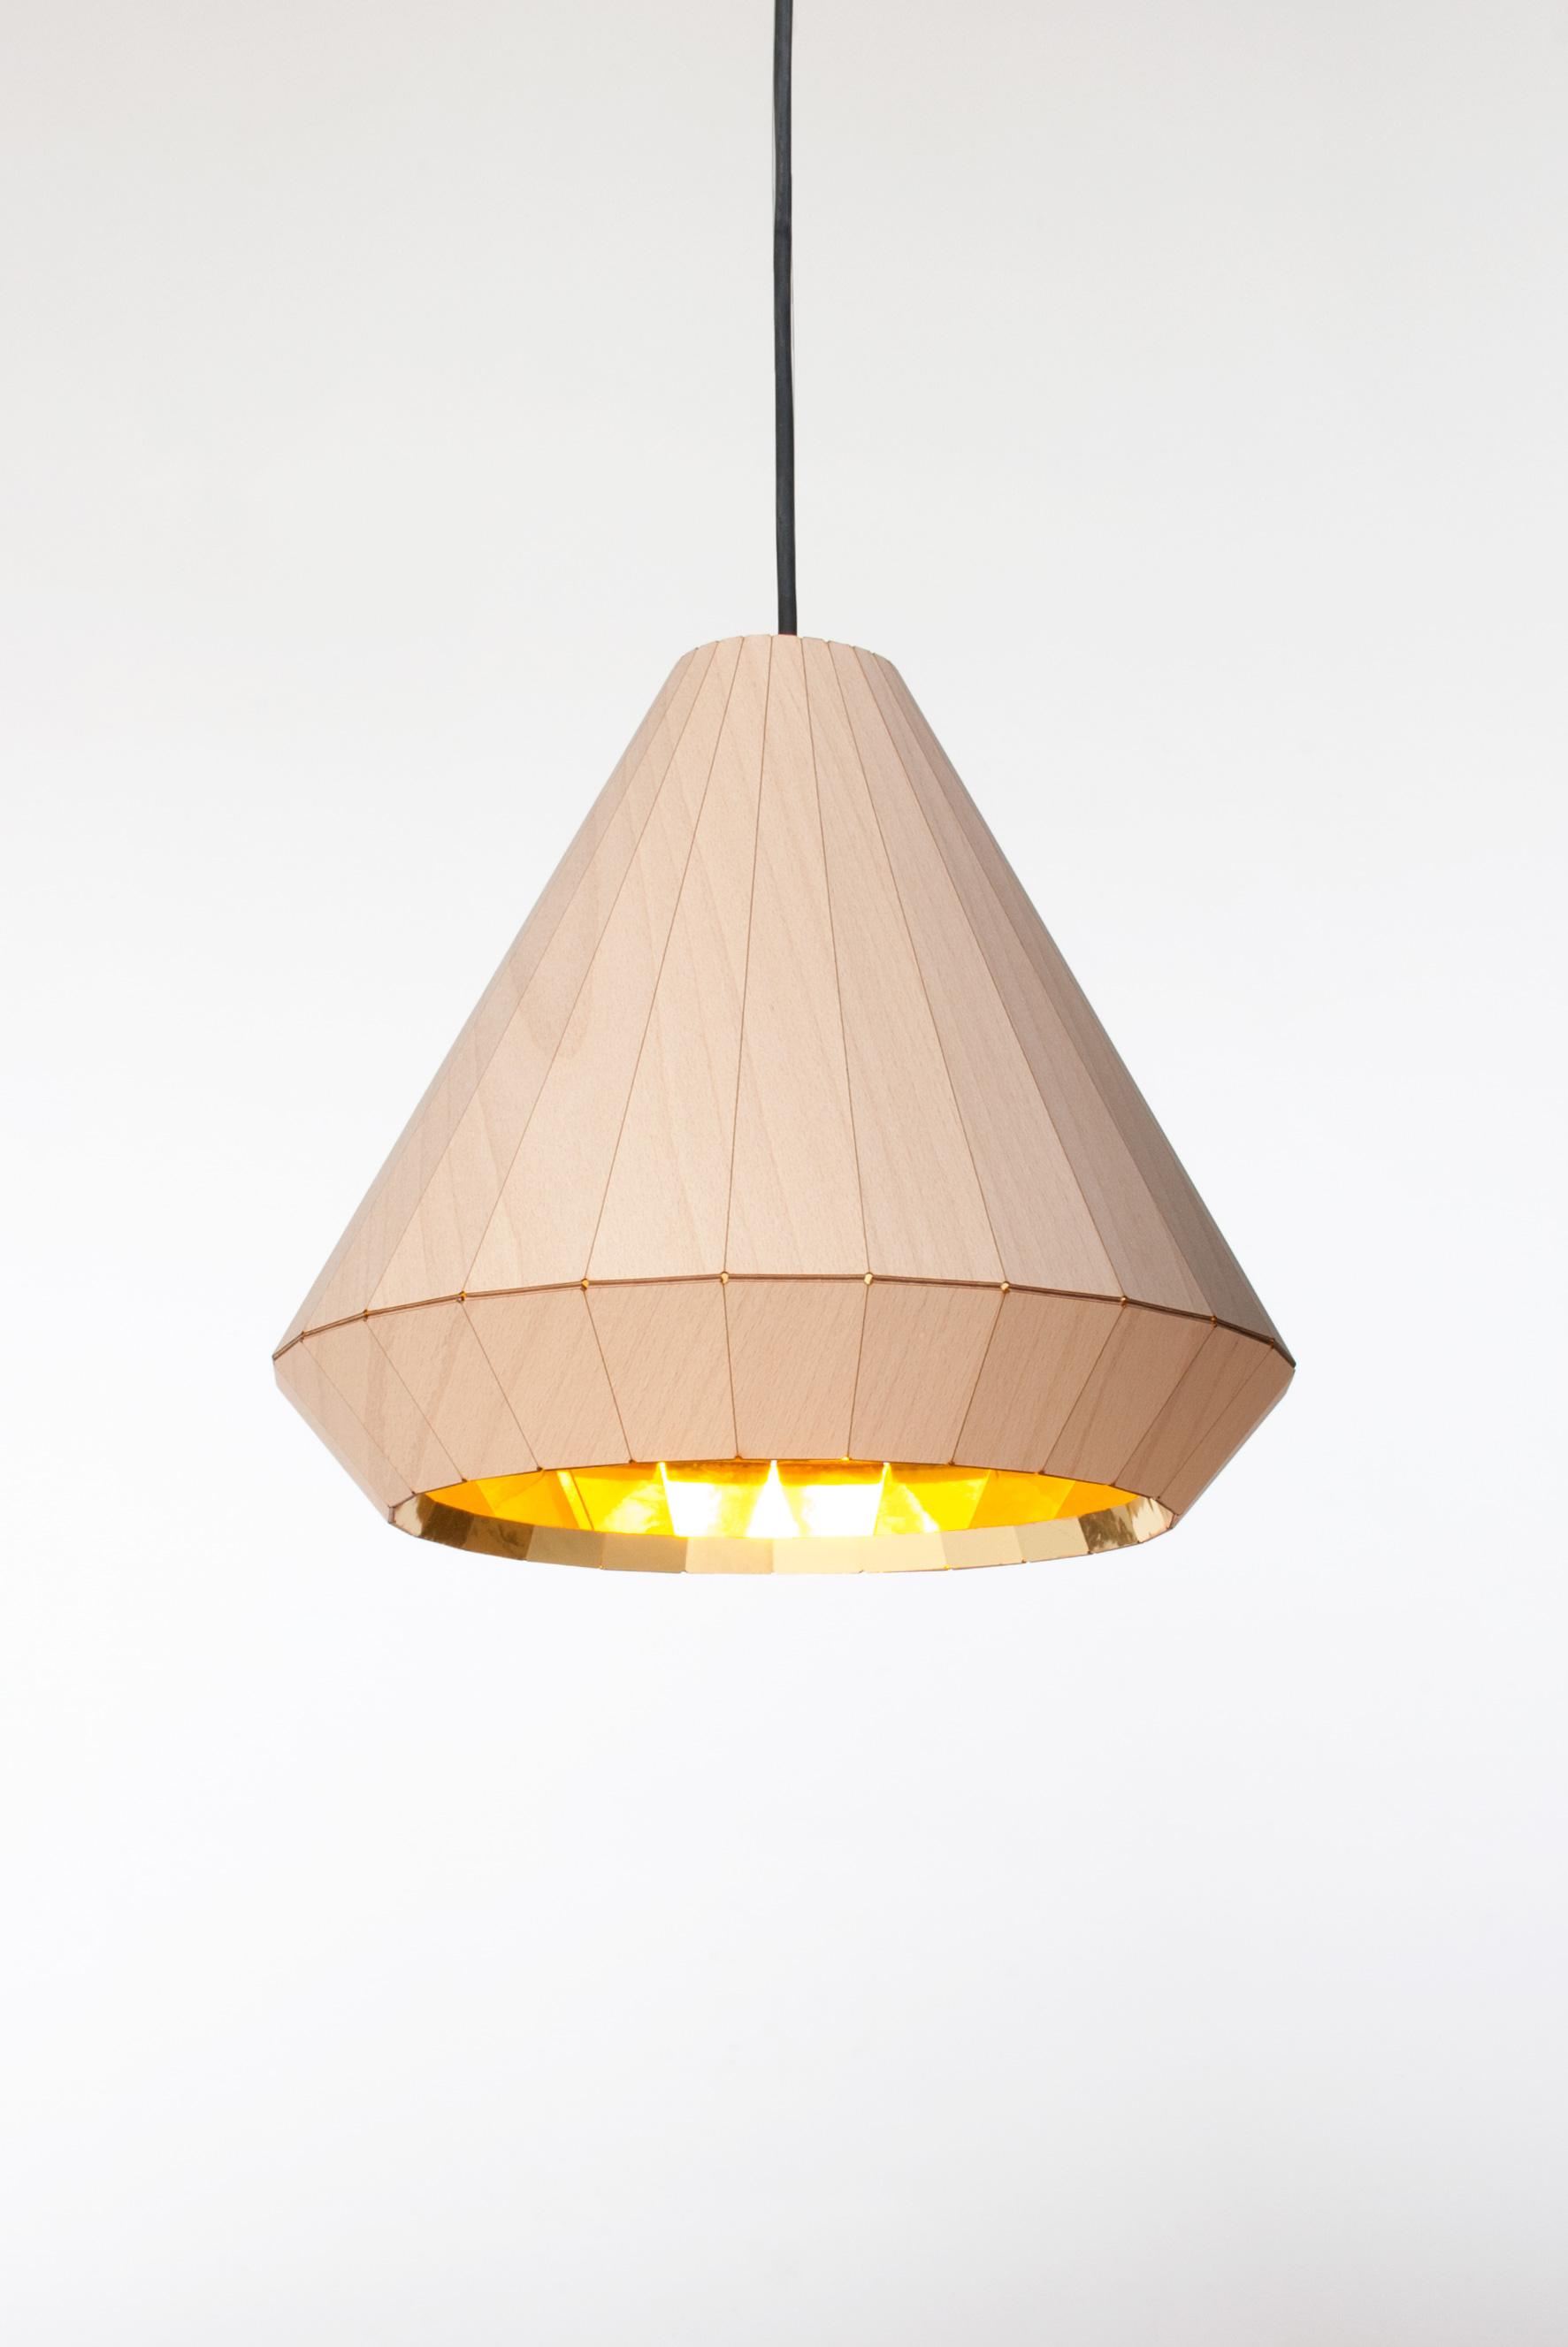 David Derksen Design wooden lamp